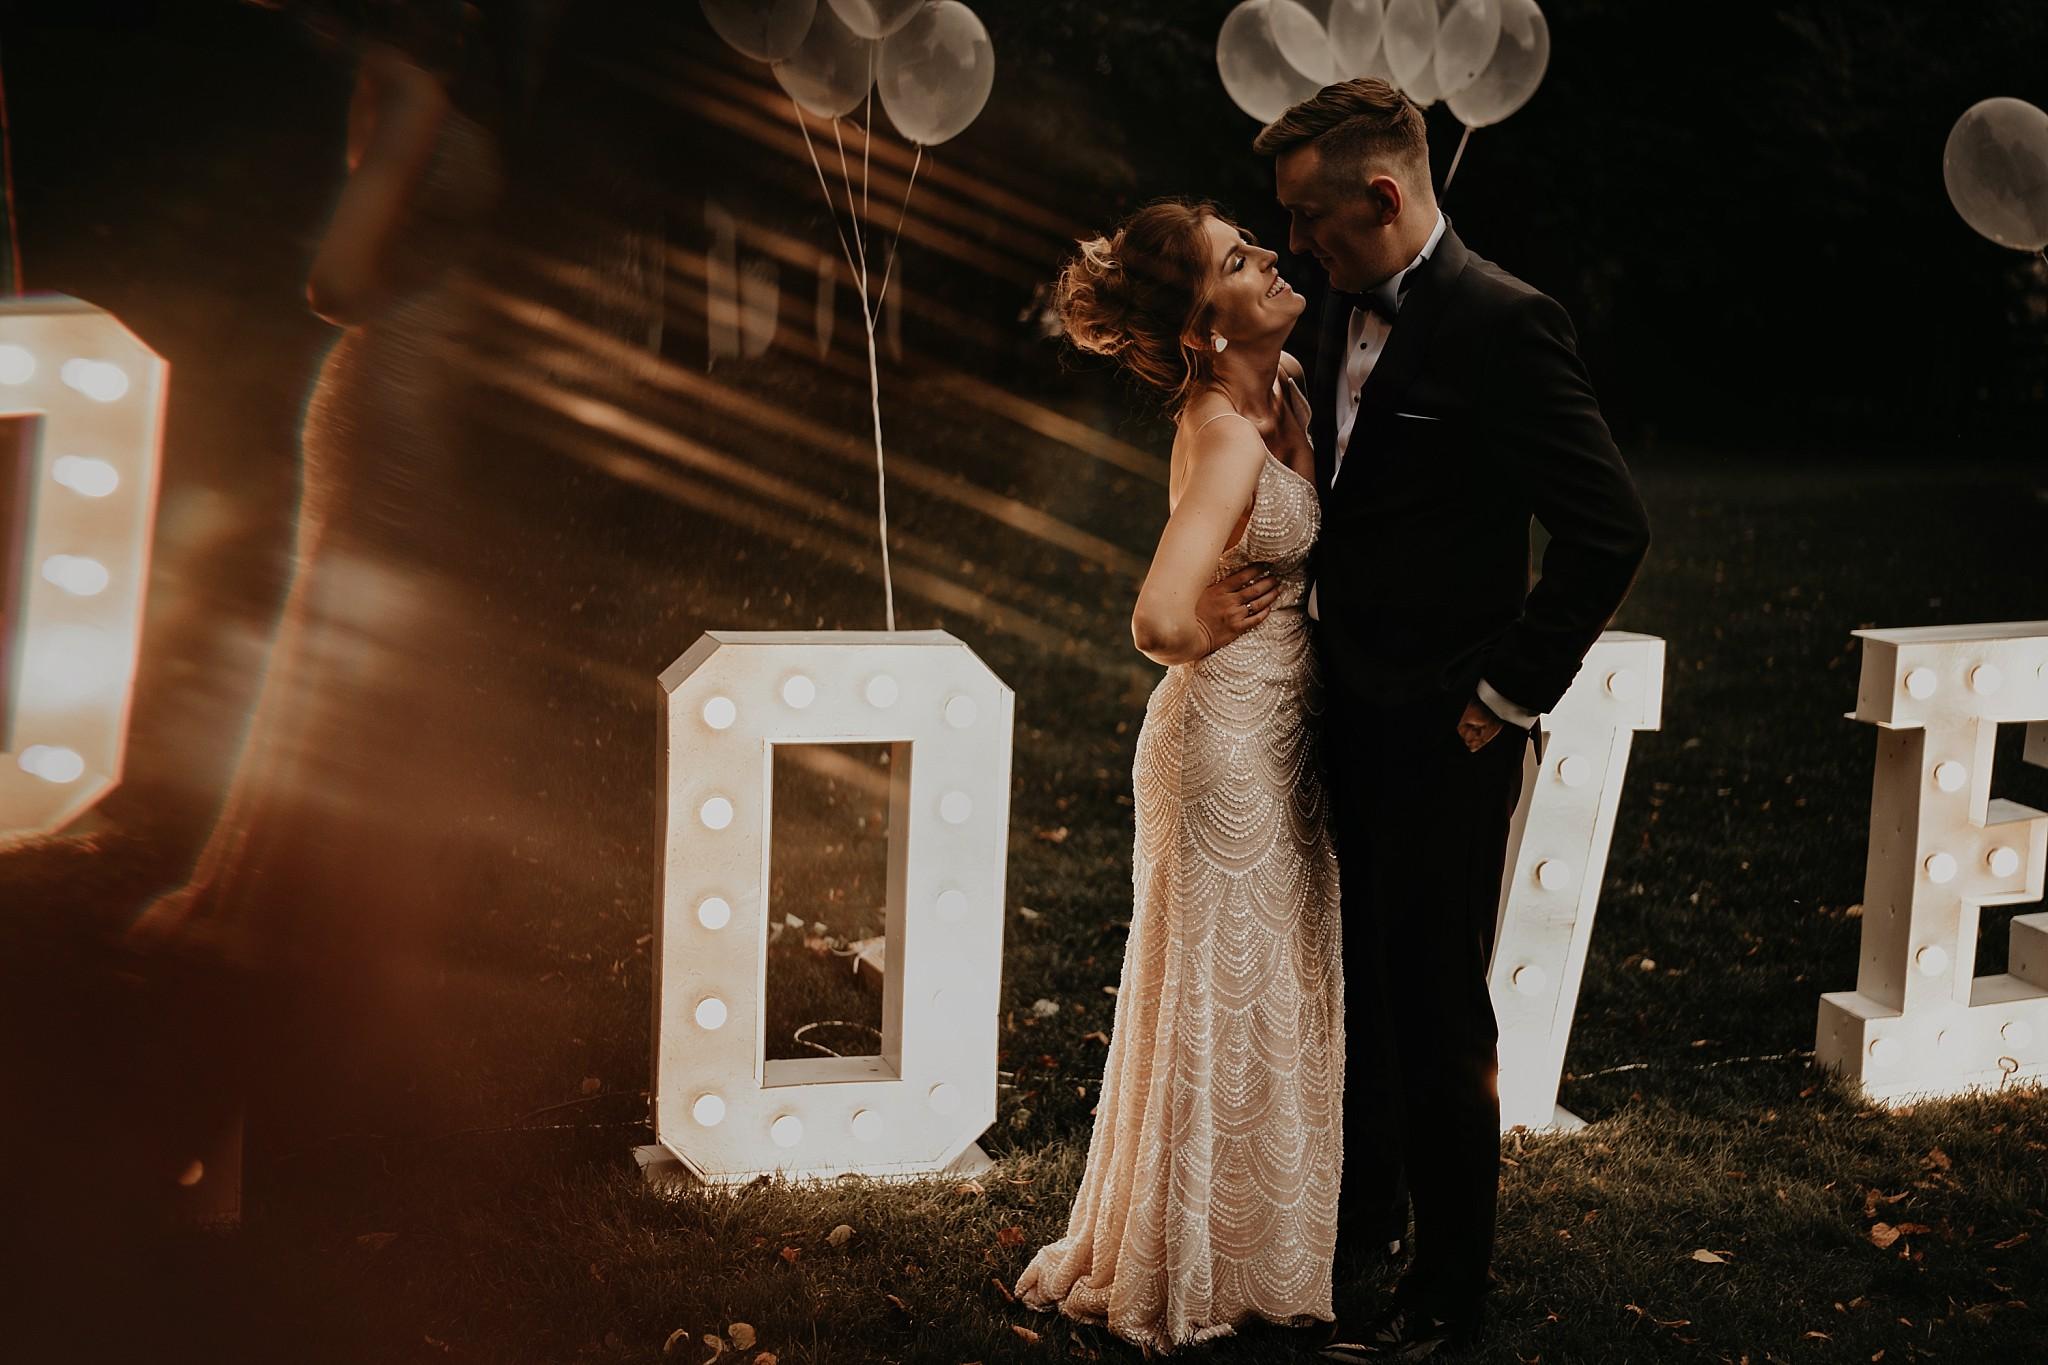 fotograf poznan wesele dobra truskawka piekne wesele pod poznaniem wesele w dobrej truskawce piekna para mloda slub marzen slub koronawirus slub listopad wesele koronawirus 349